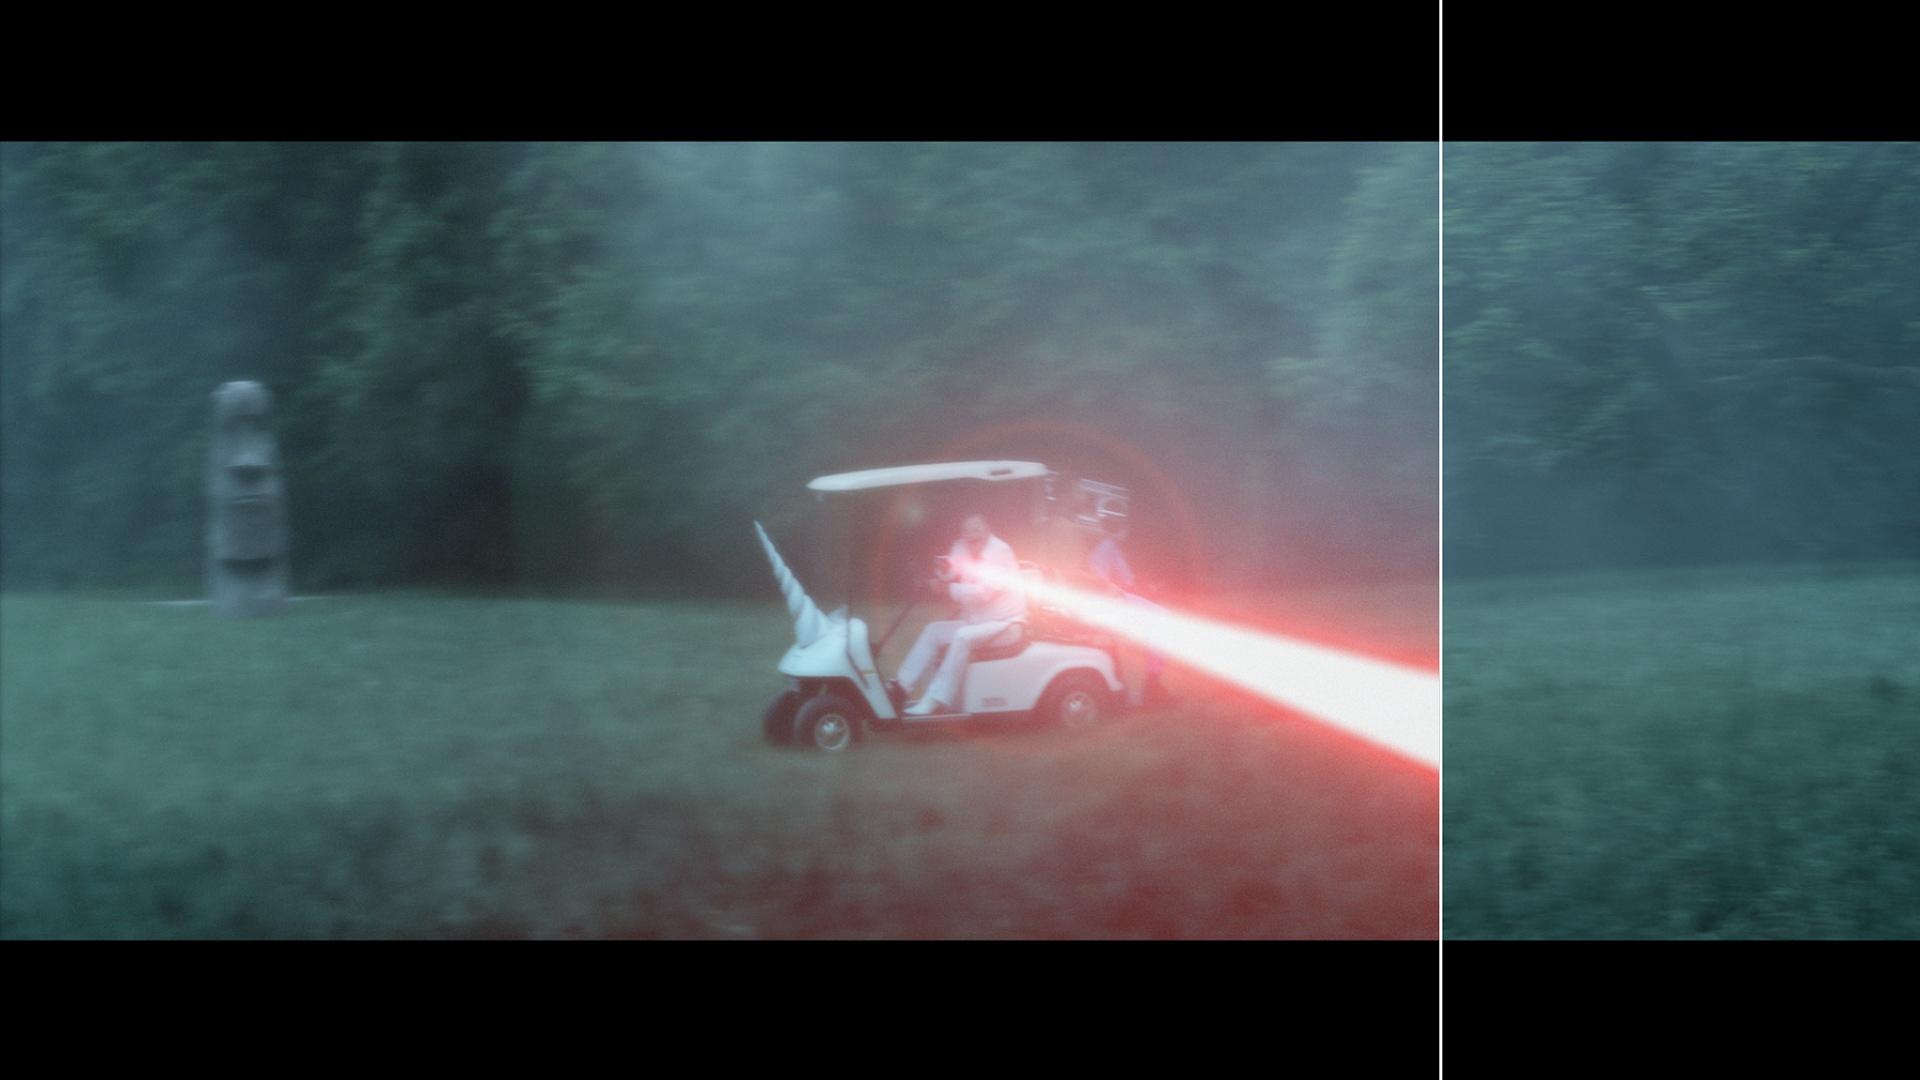 erste-laser-fight-01